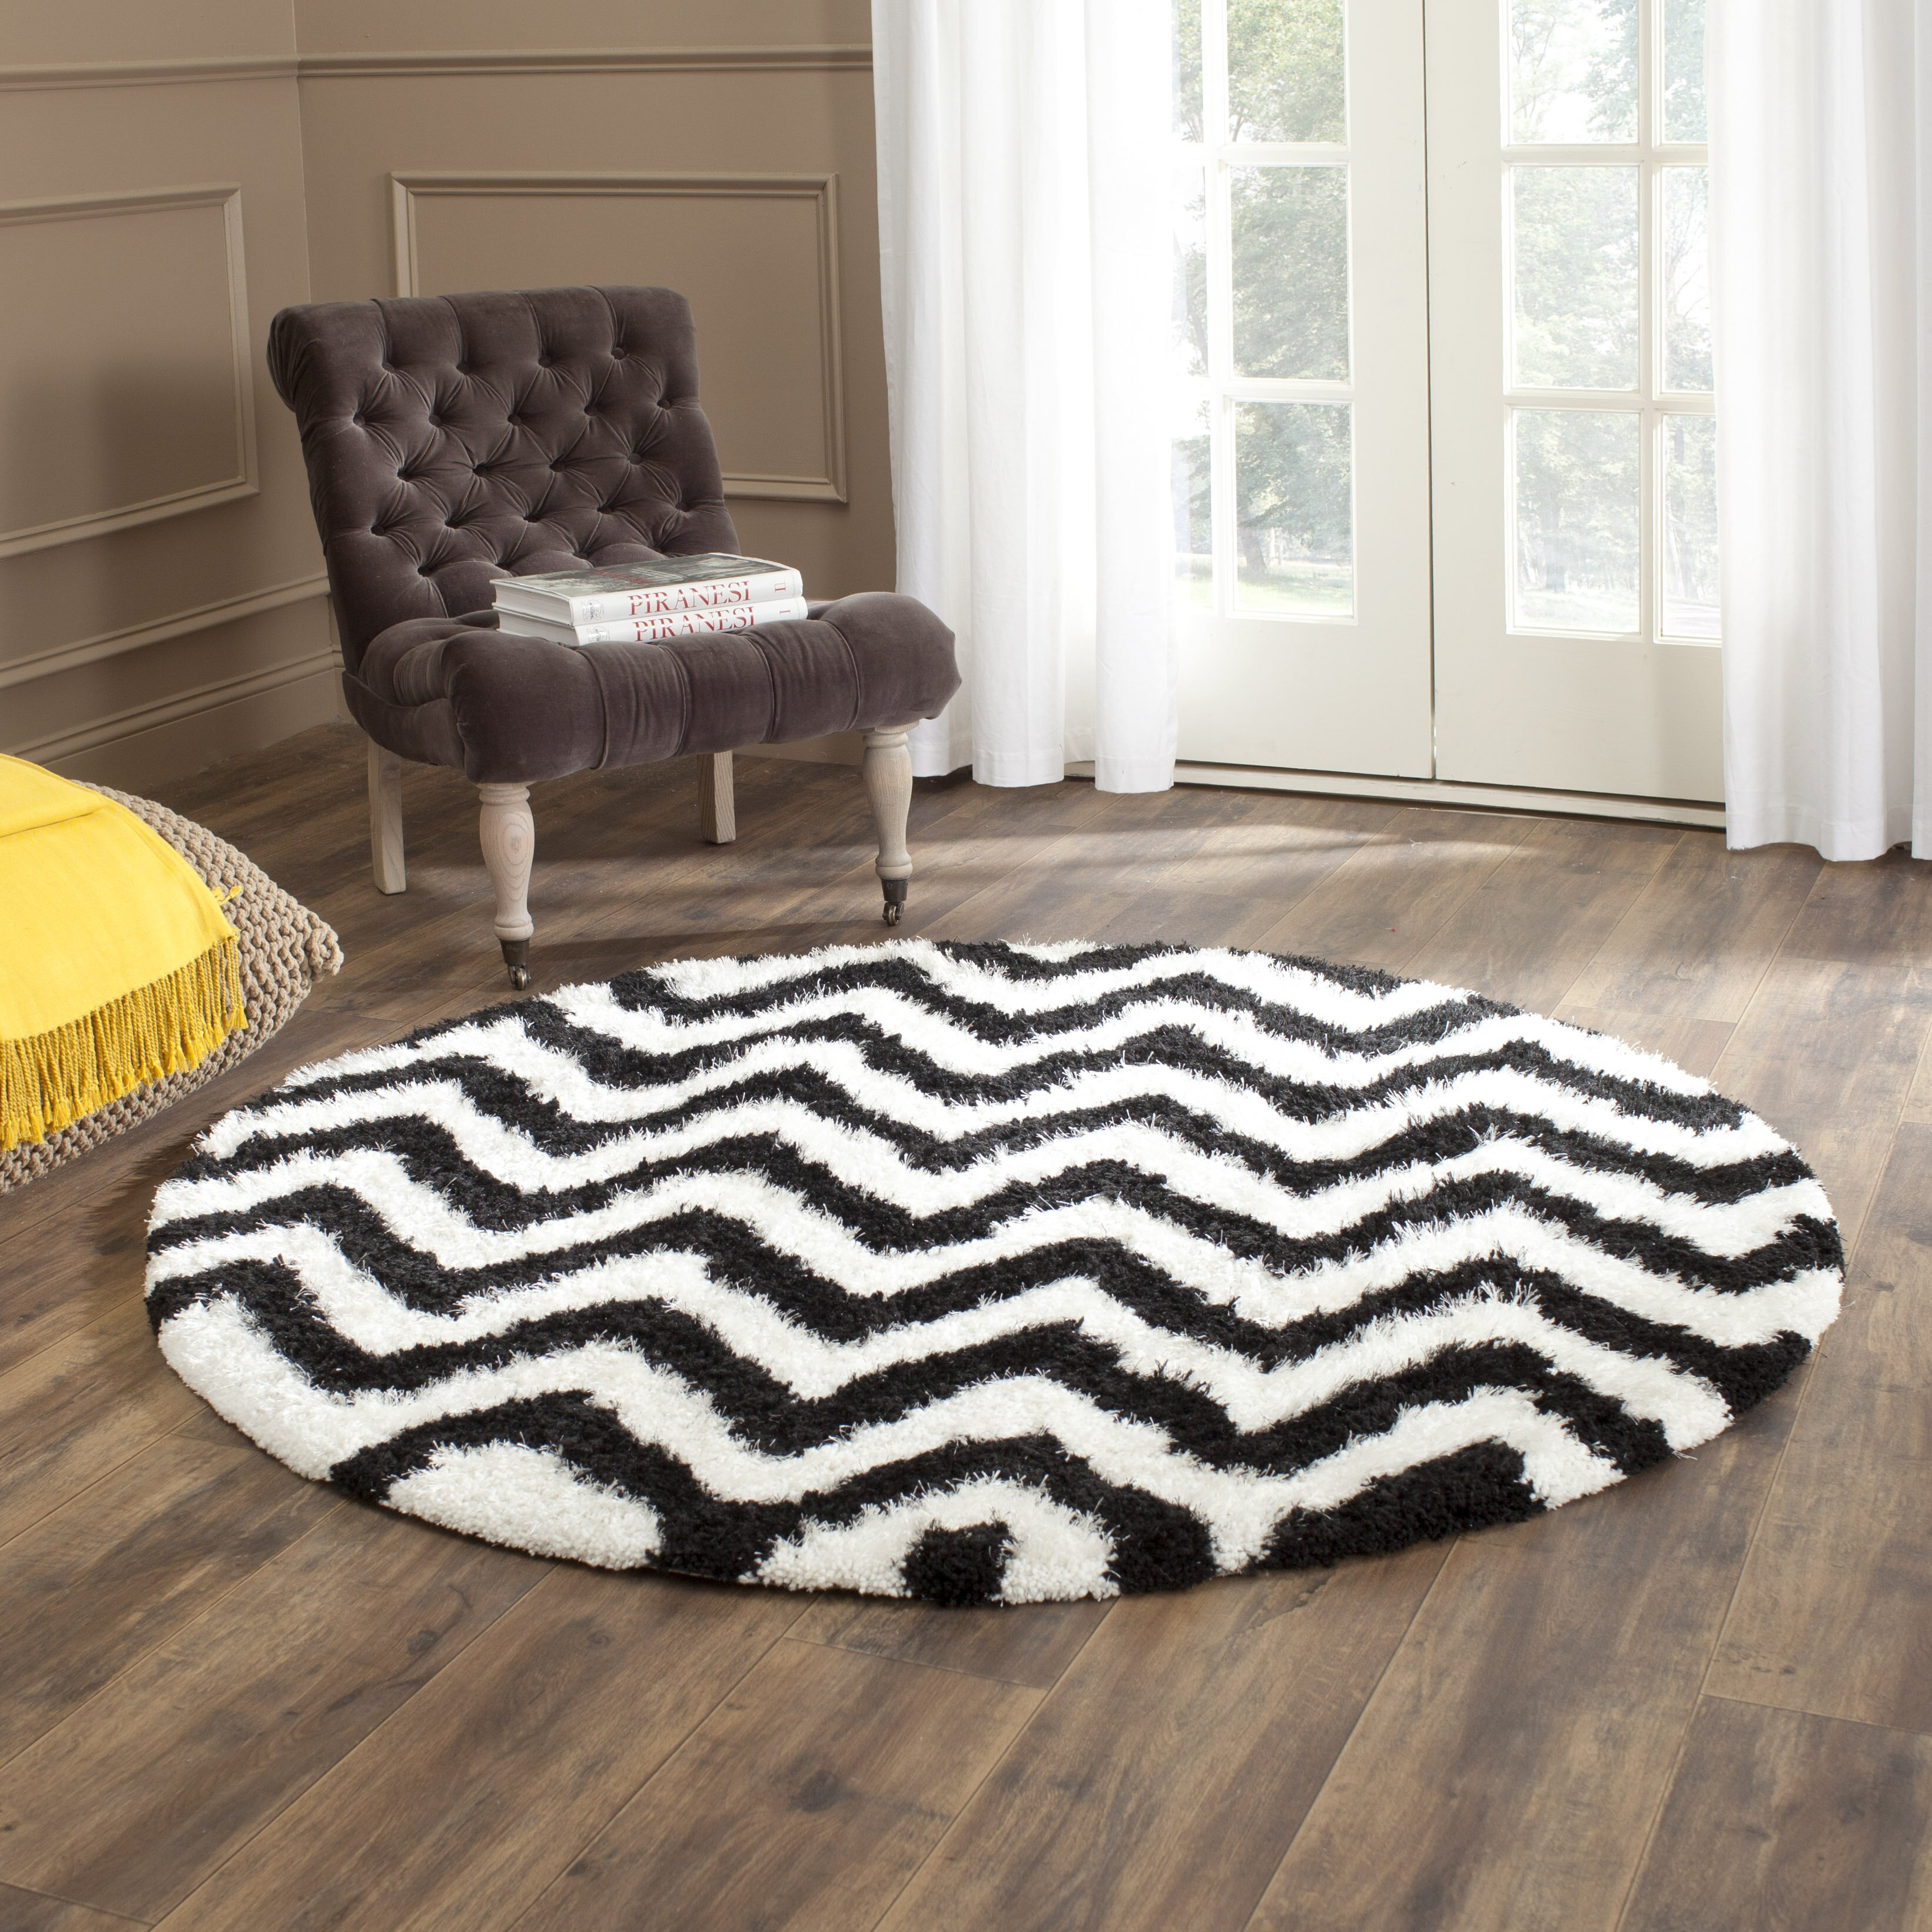 safavieh barcelona white black area rug reviews wayfair. Black Bedroom Furniture Sets. Home Design Ideas